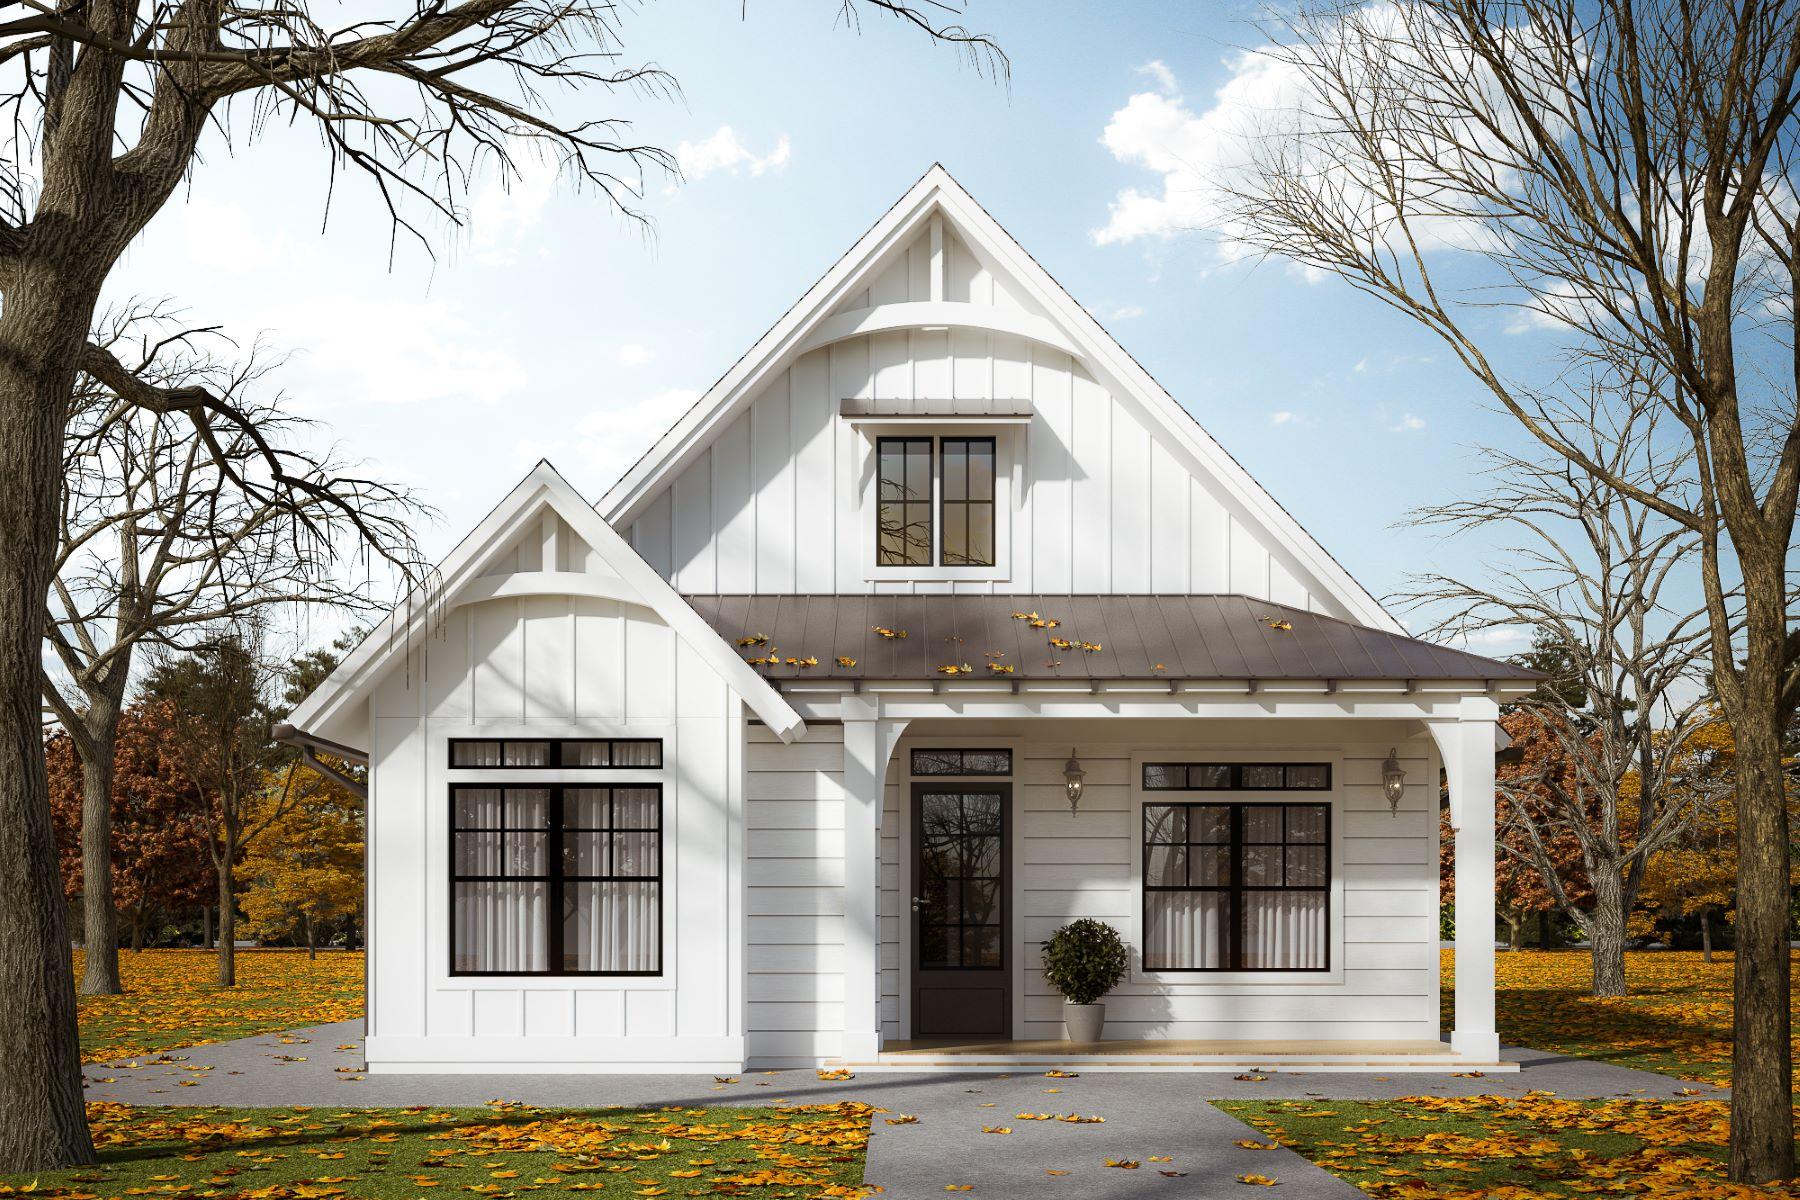 Single Family Home for Sale at 3927 Farm View Drive, Boise 3927 W Farm View Dr Boise, Idaho 83714